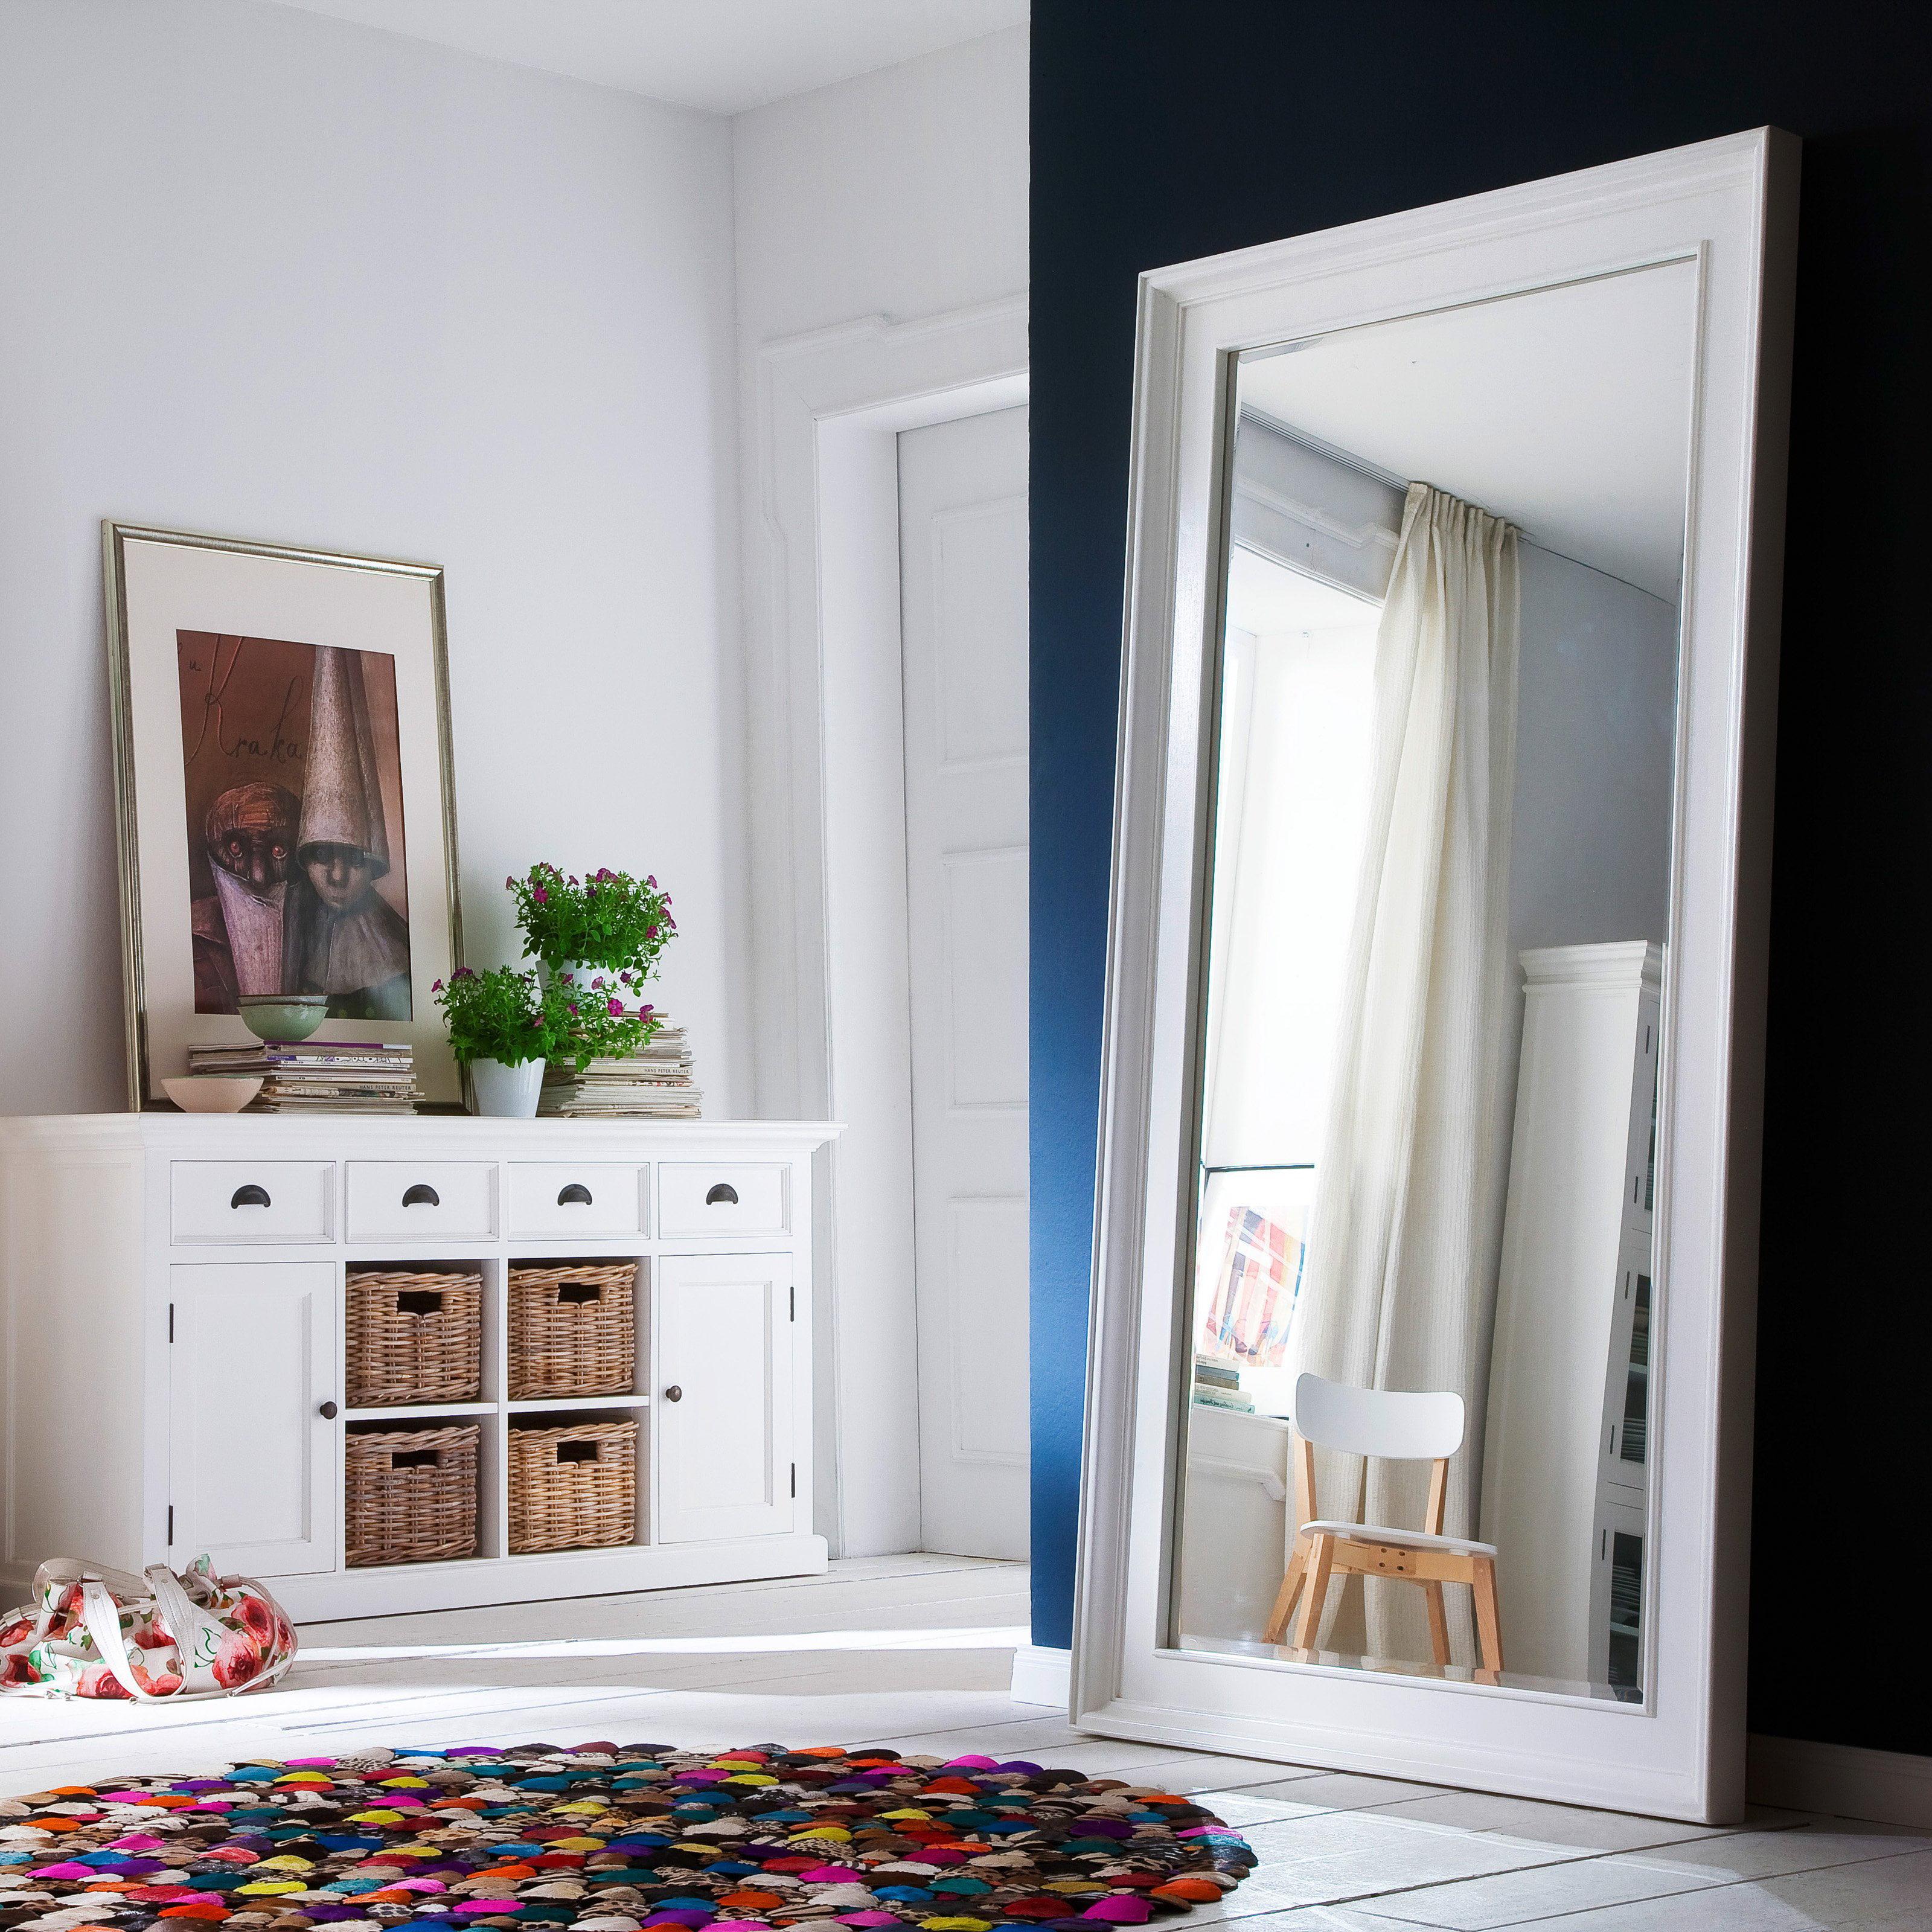 Nova Solo Halifax Grand Wall Mirror by Nova Solo Furniture LLC